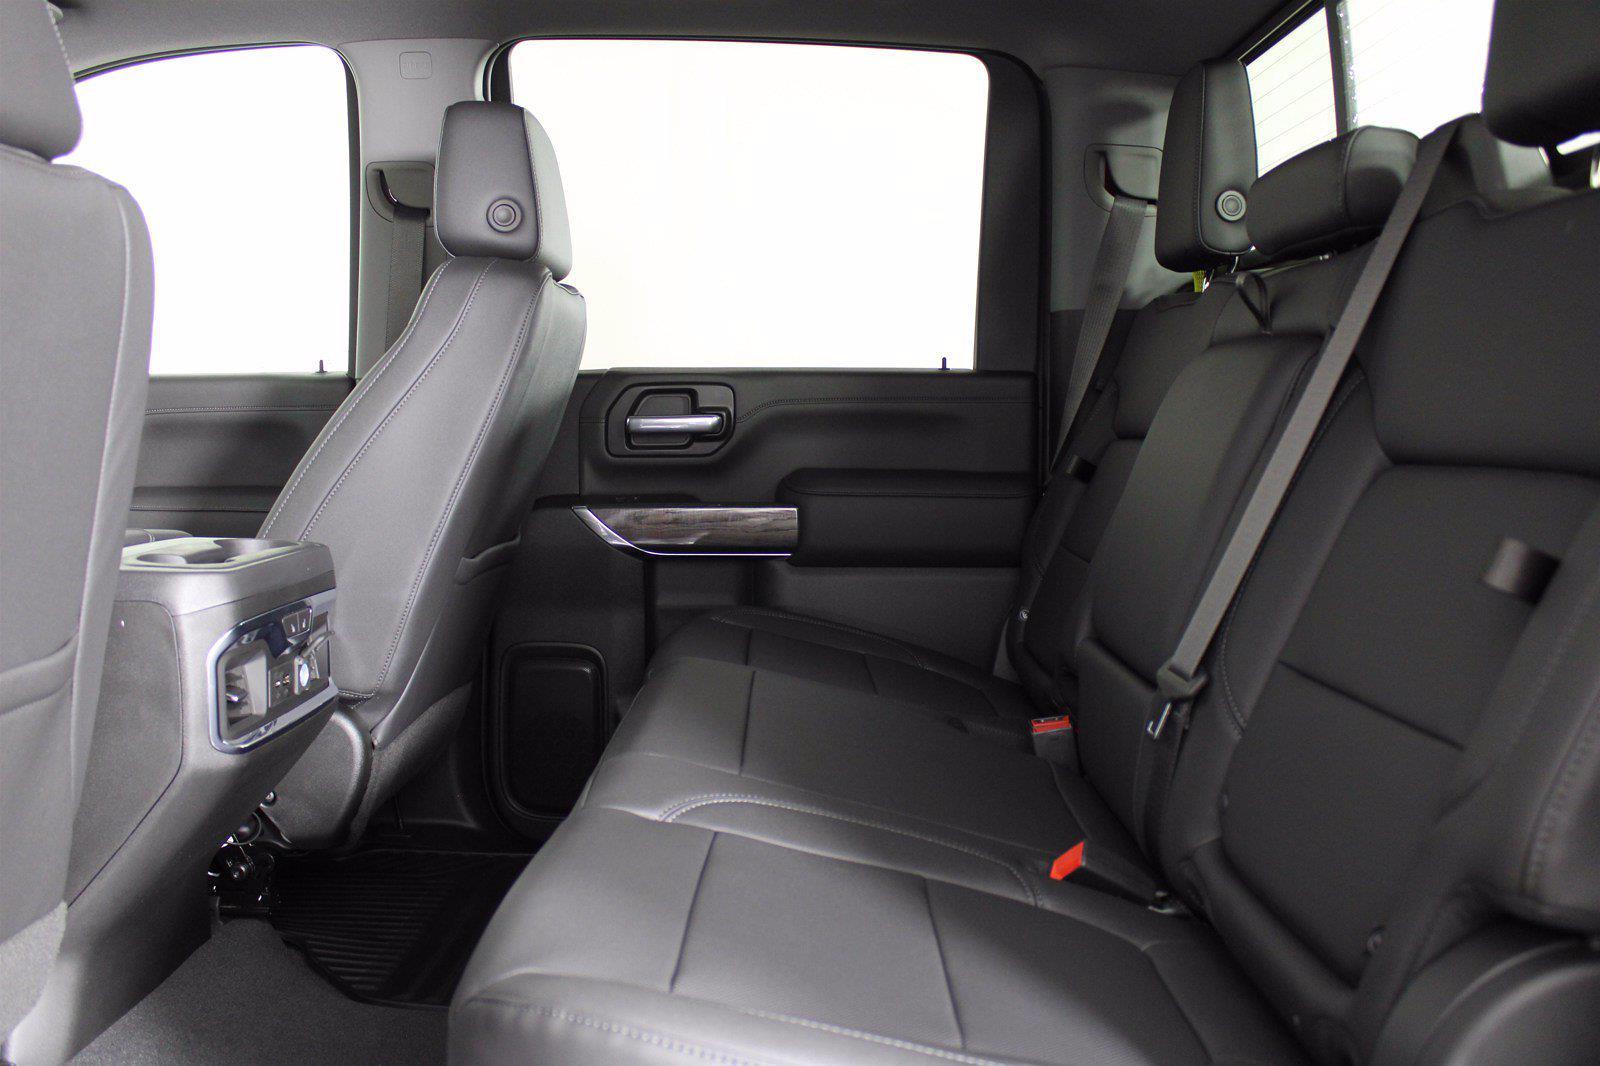 2021 Chevrolet Silverado 2500 Crew Cab 4x4, Pickup #D110744 - photo 16